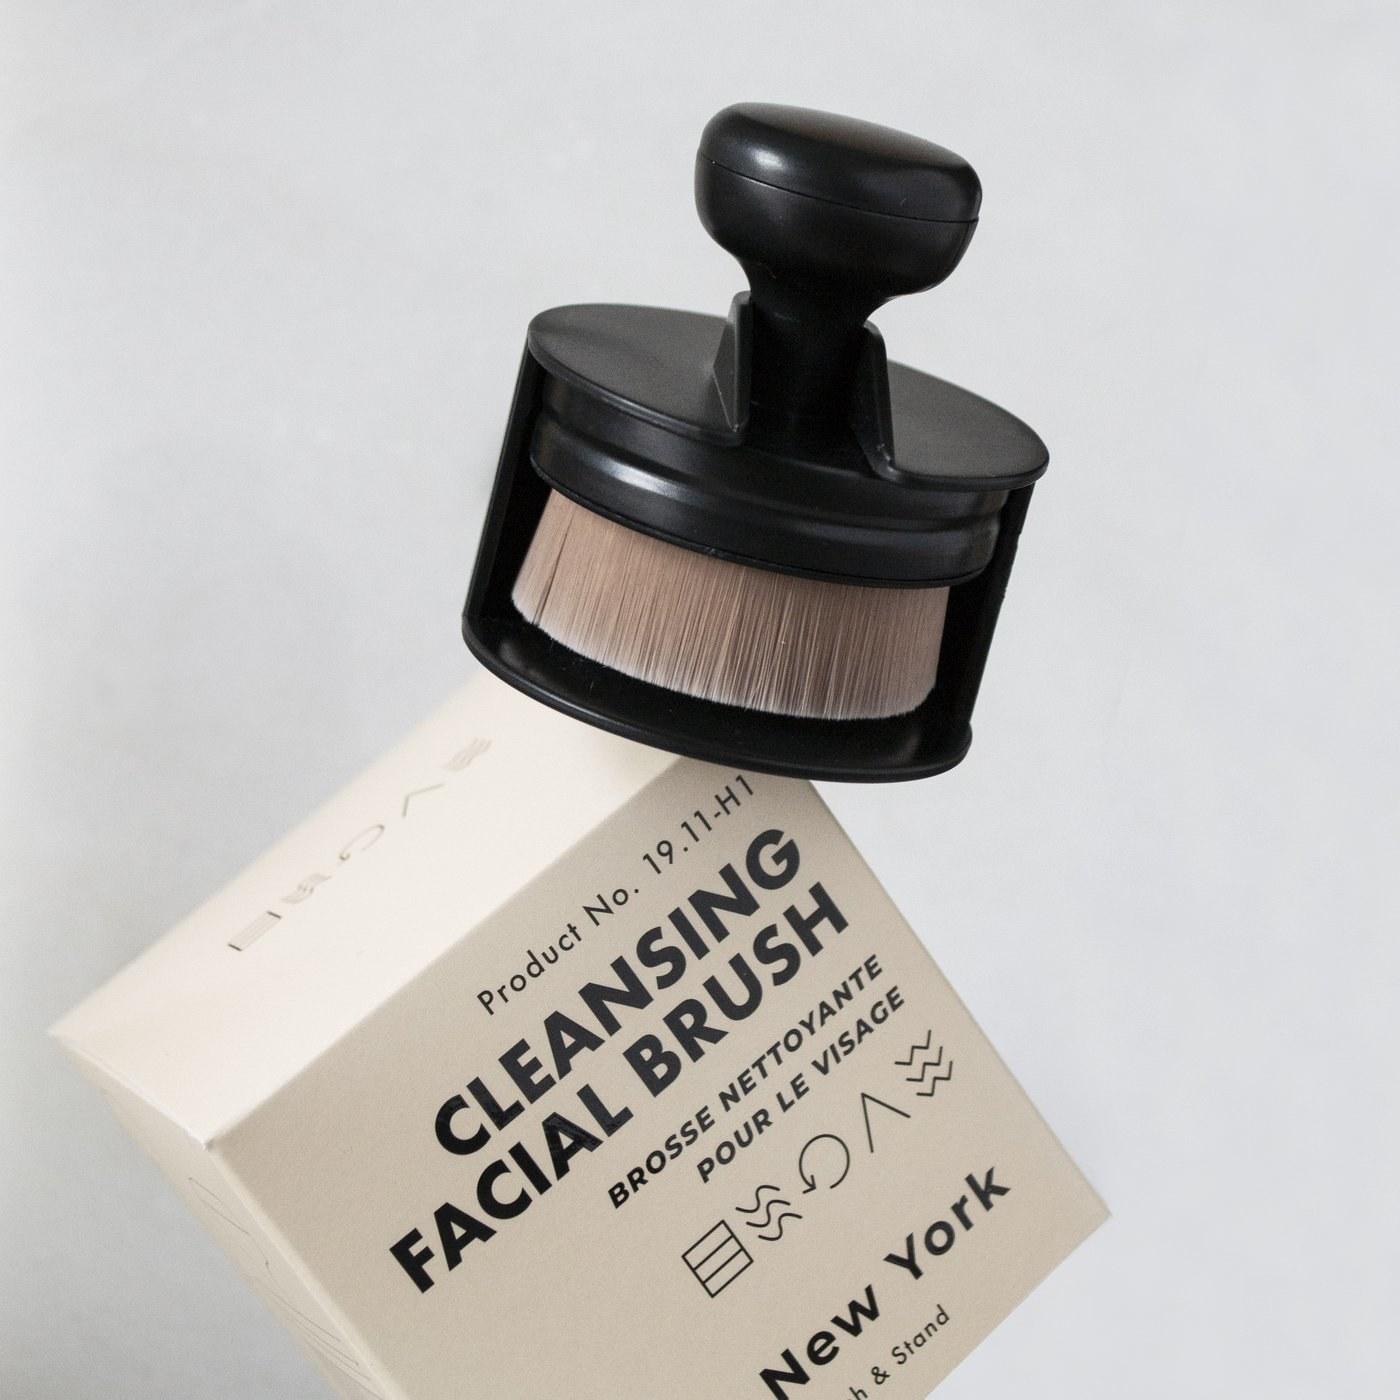 Cleansing facial brush